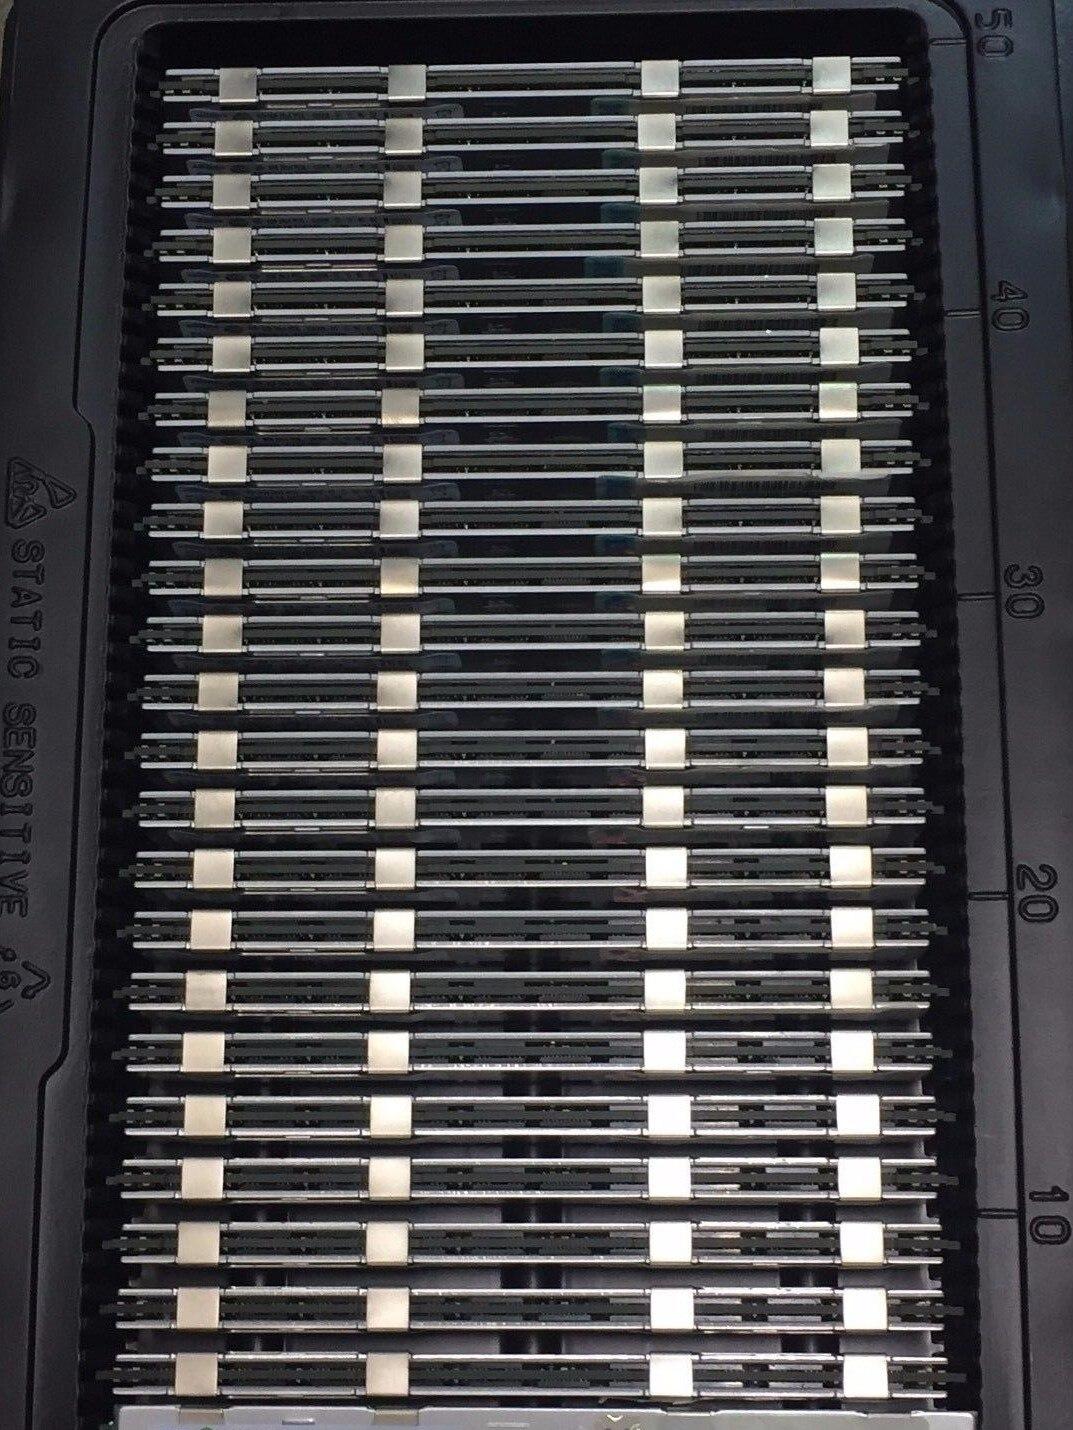 X3250M4 X3250M5 X3100M5 4G 4GB 2RX8 PC3-12800E Tested Good